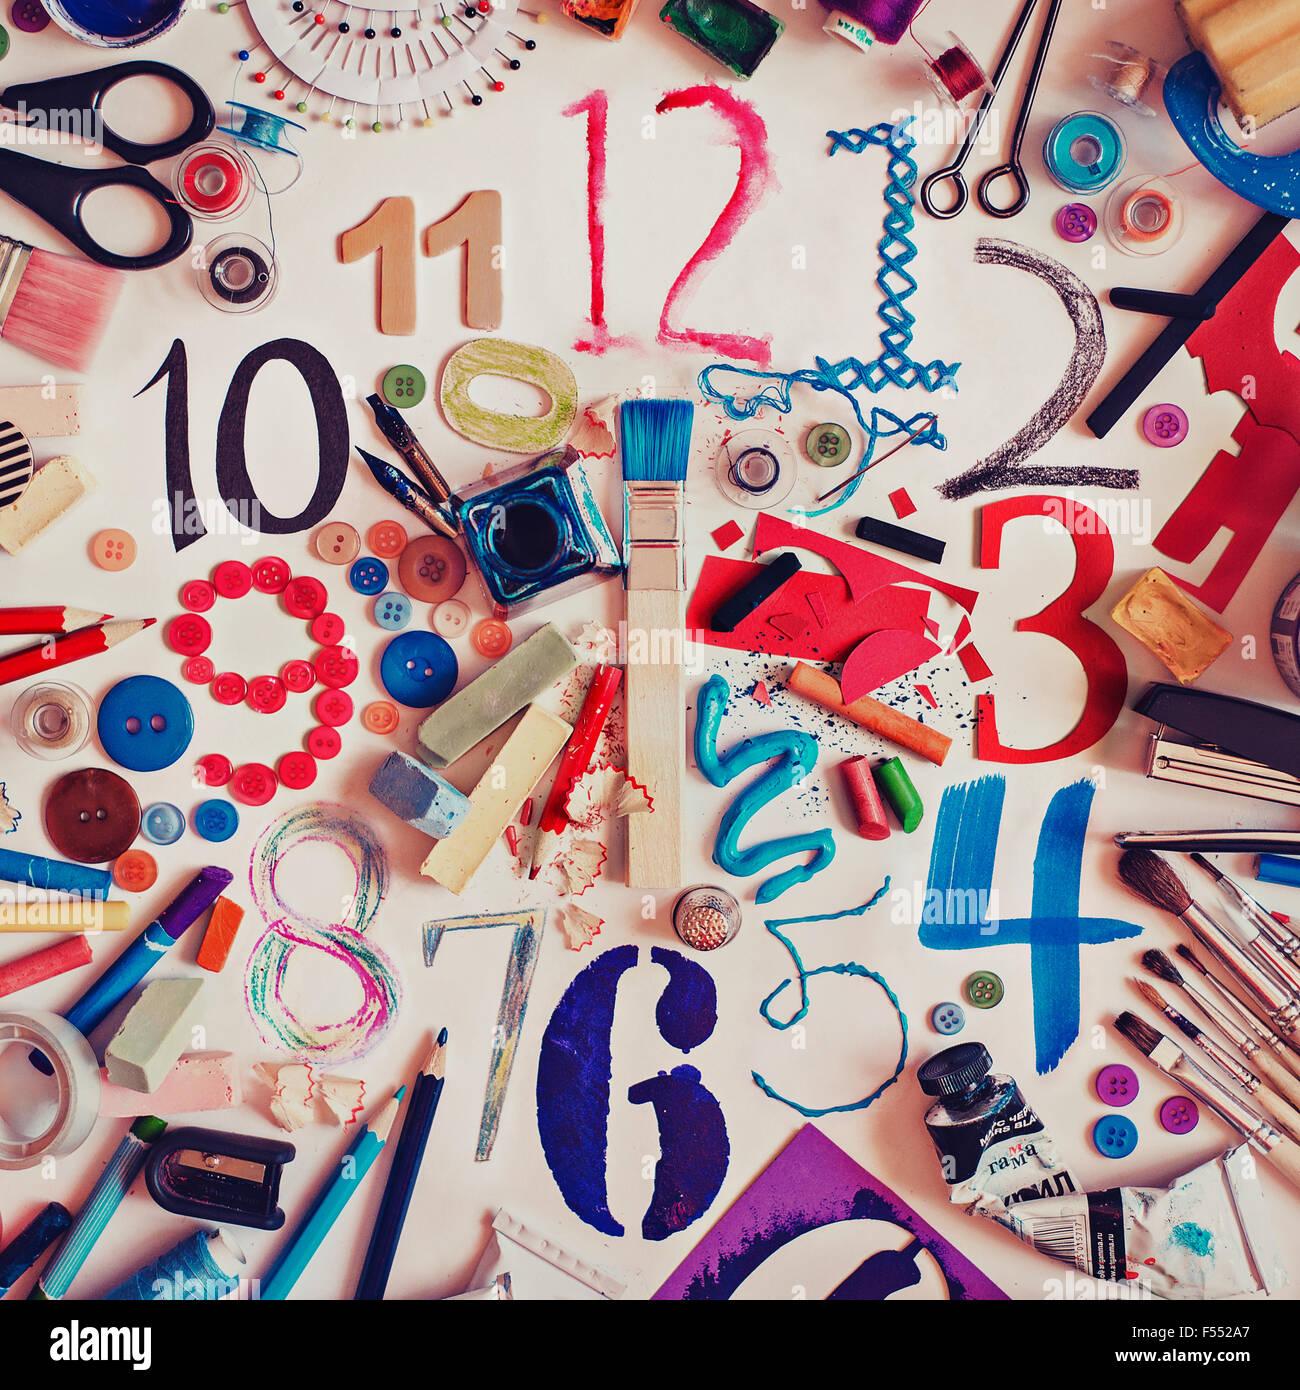 Art clock - Stock Image